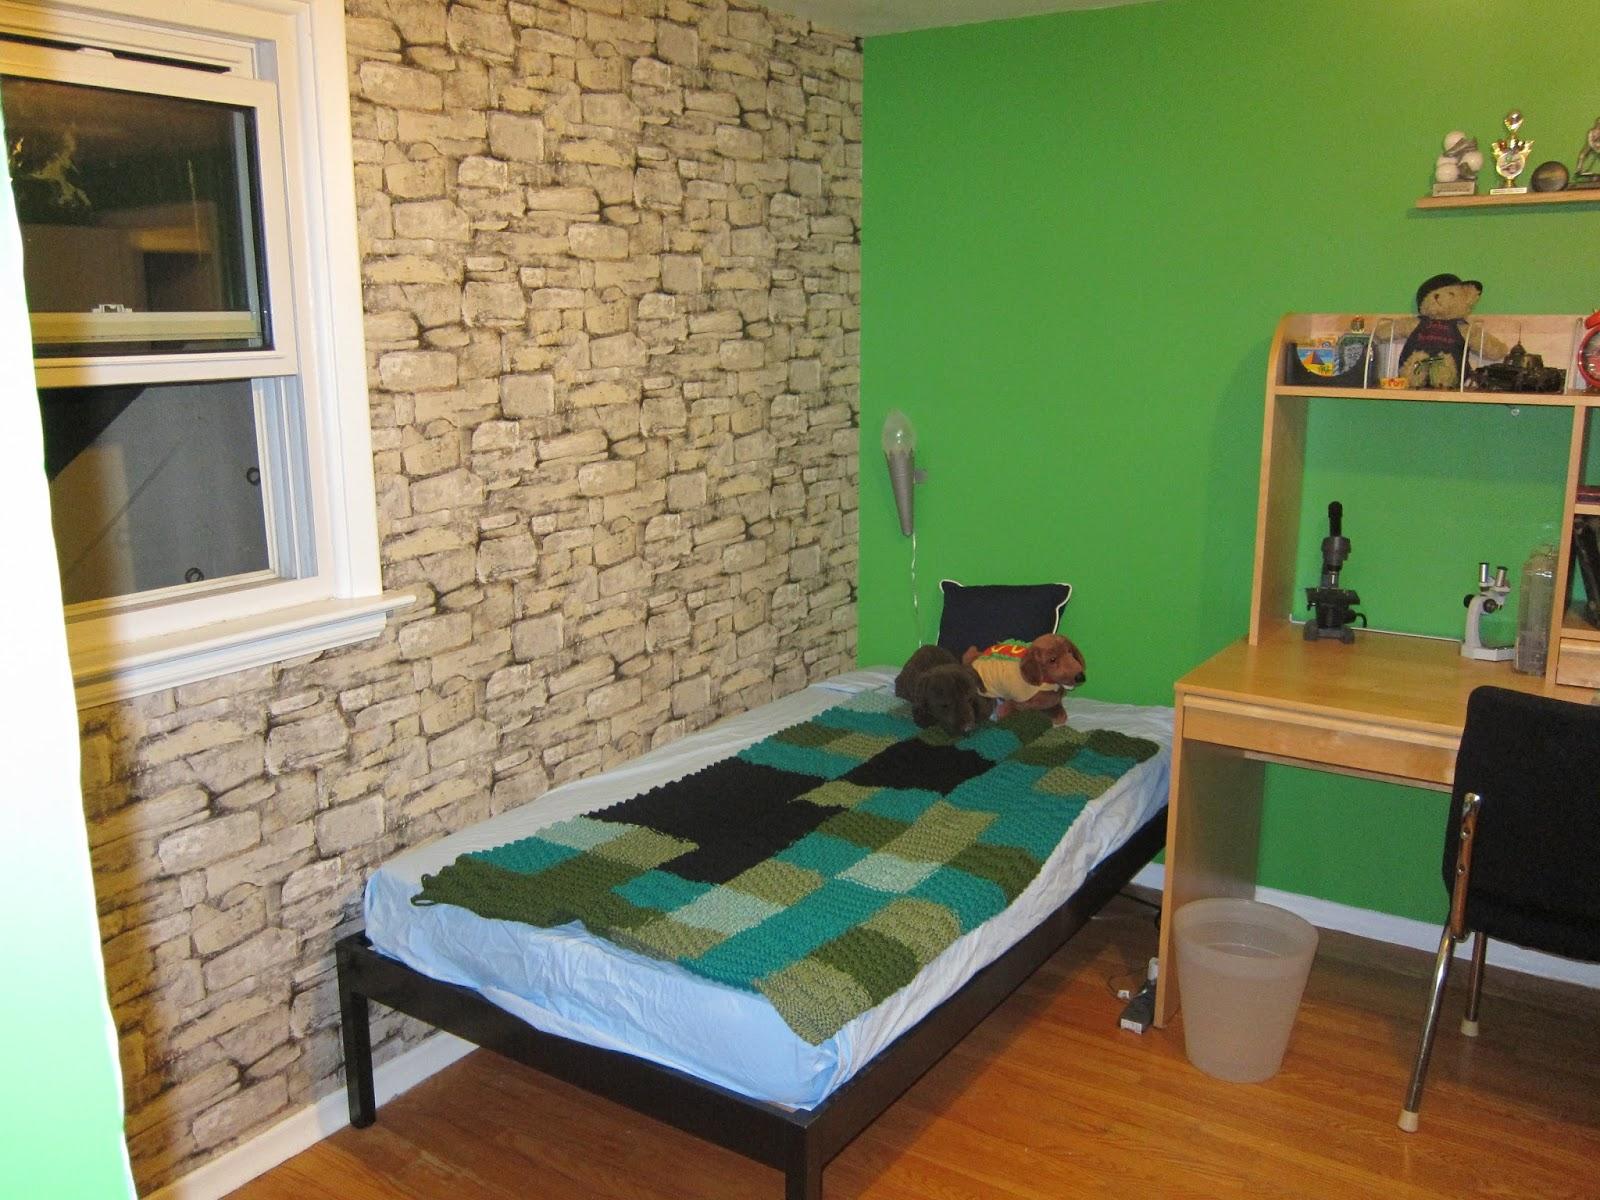 Minecraft Bedroom Wallpaper Wall paper from rona 1600x1200